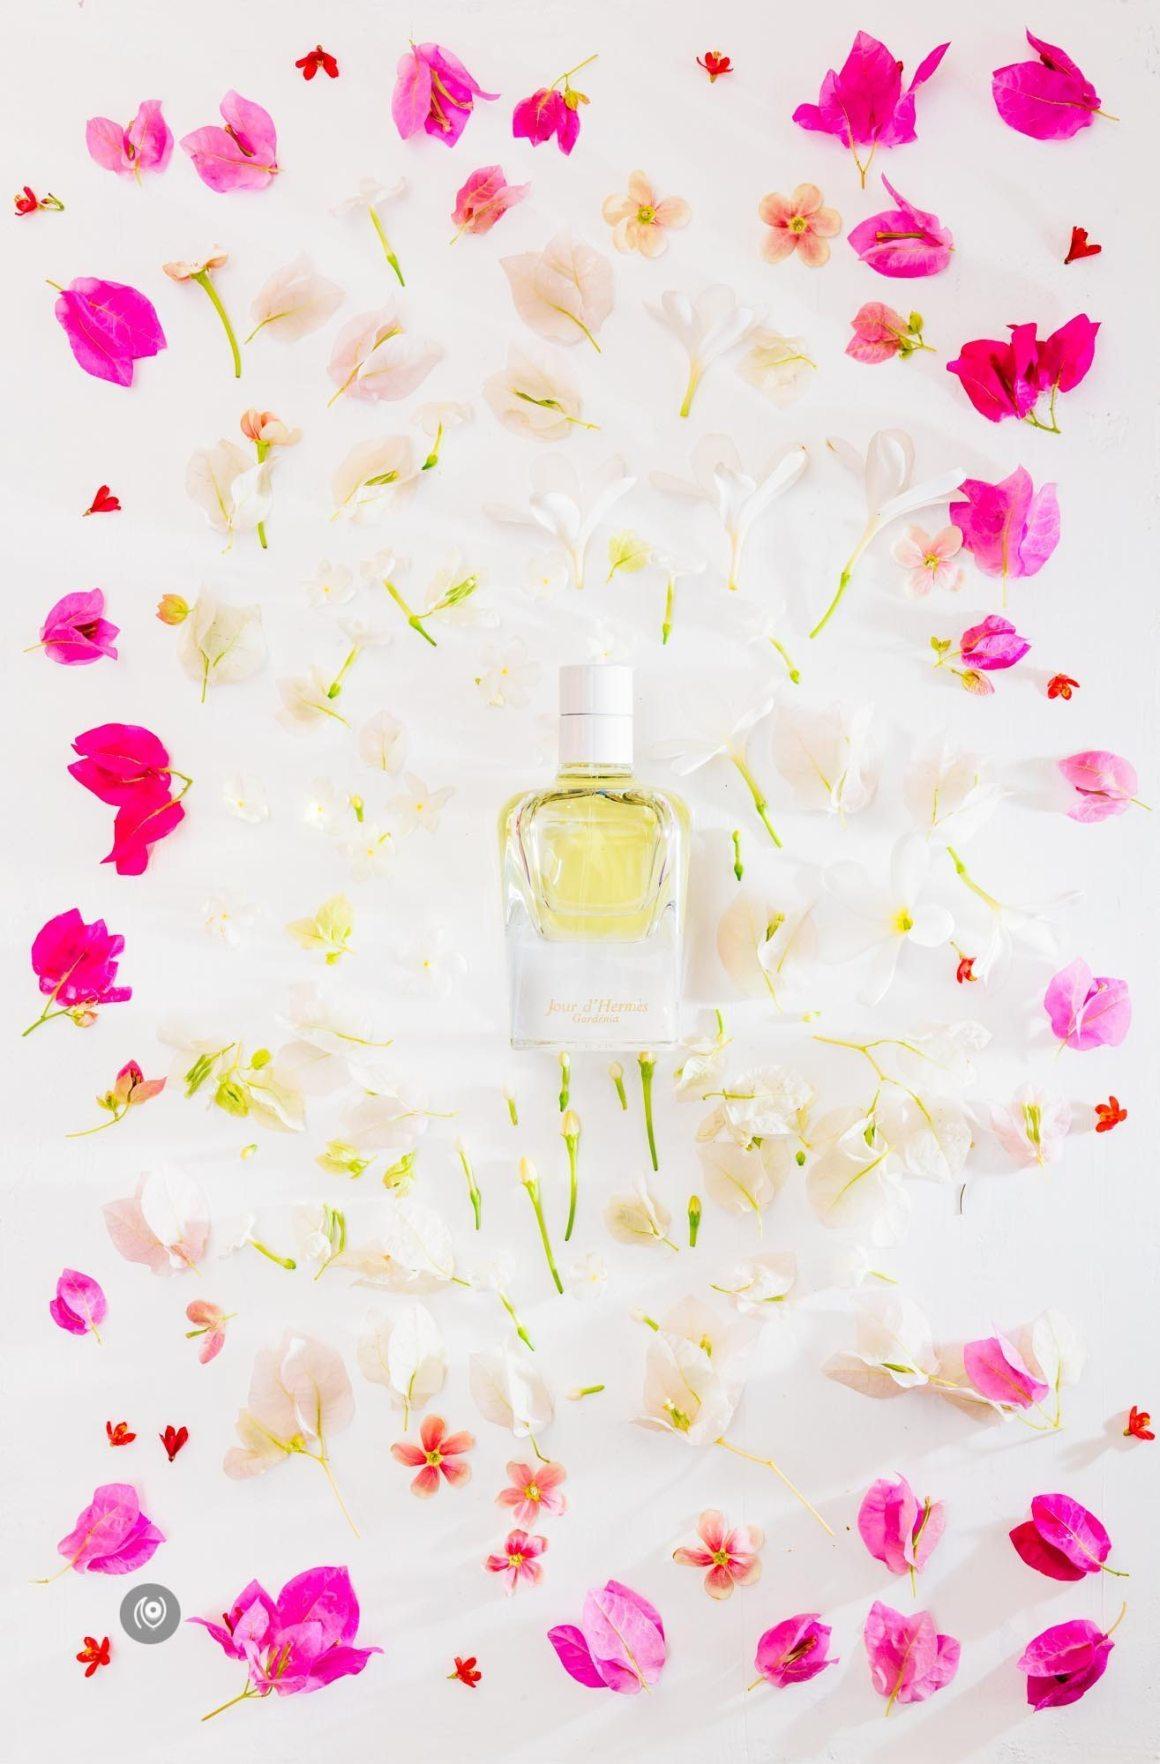 FragranceOfTheMonth-Naina.co-Jour-Hermes-Gardenia-EyesForLuxury-03